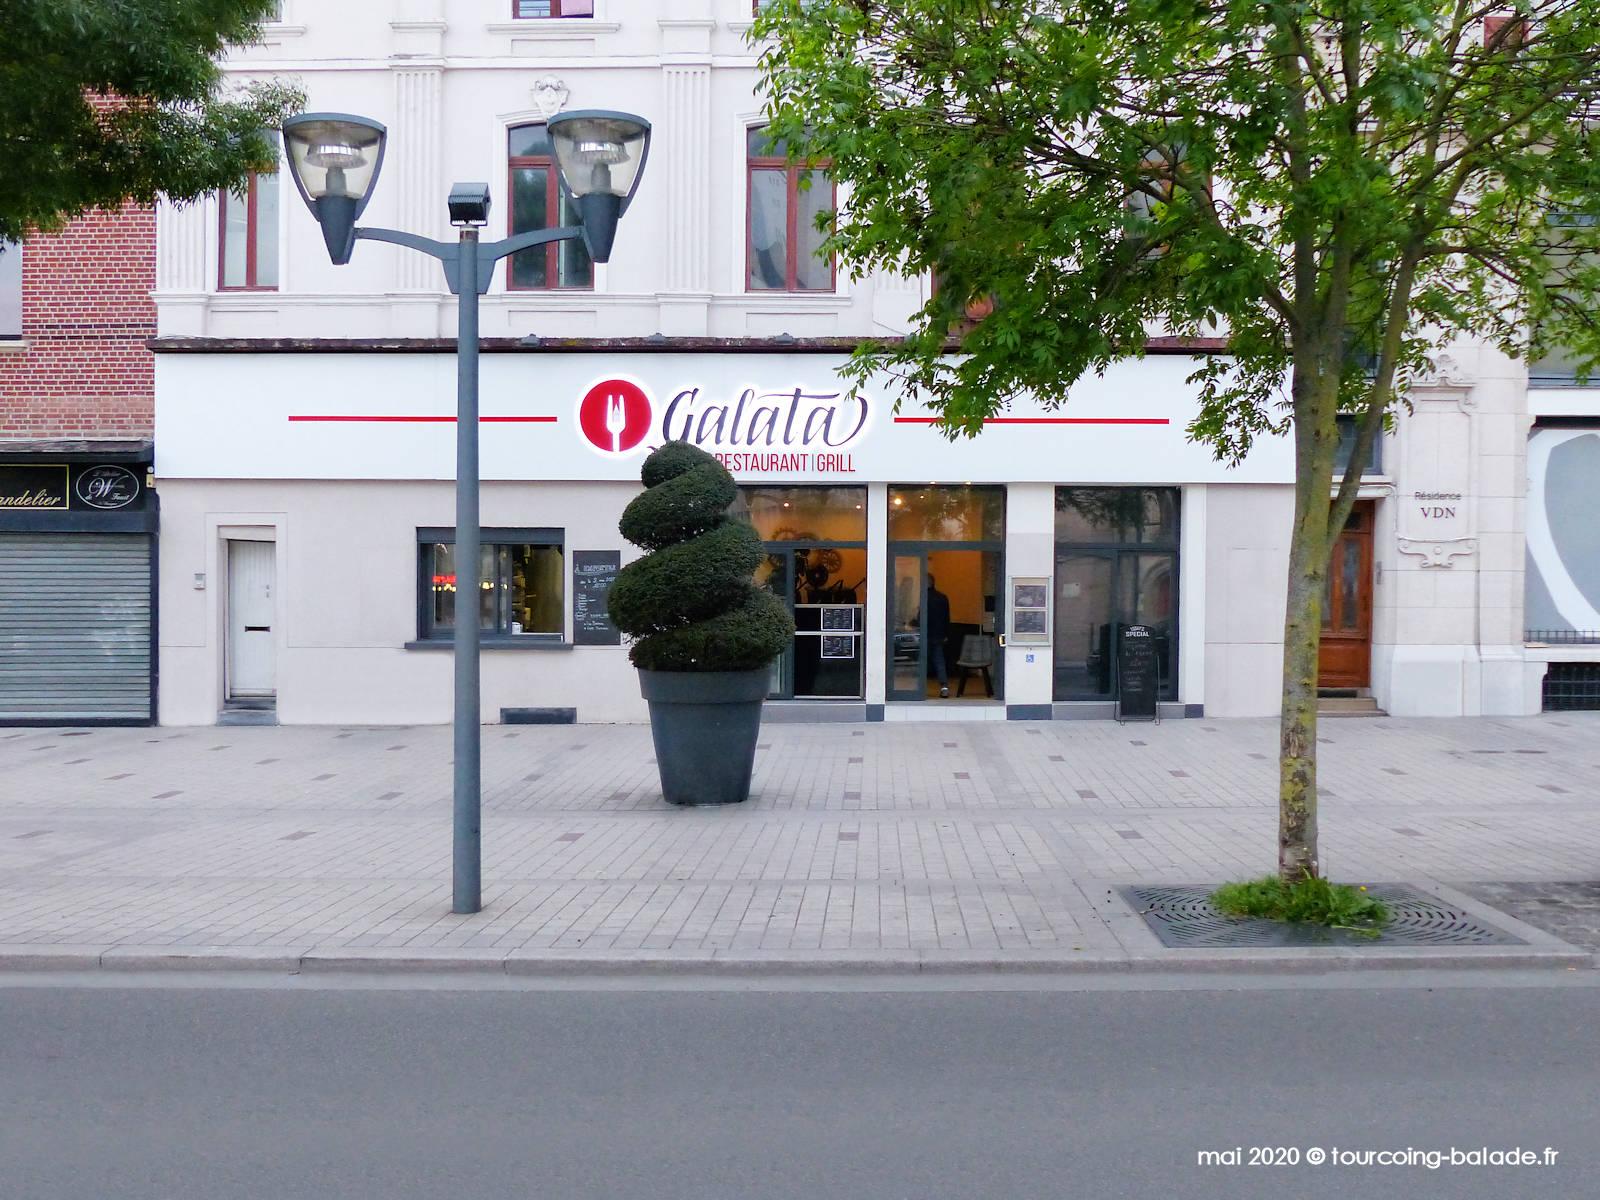 Restaurant Grill Turc, Galata, Tourcoing 2020